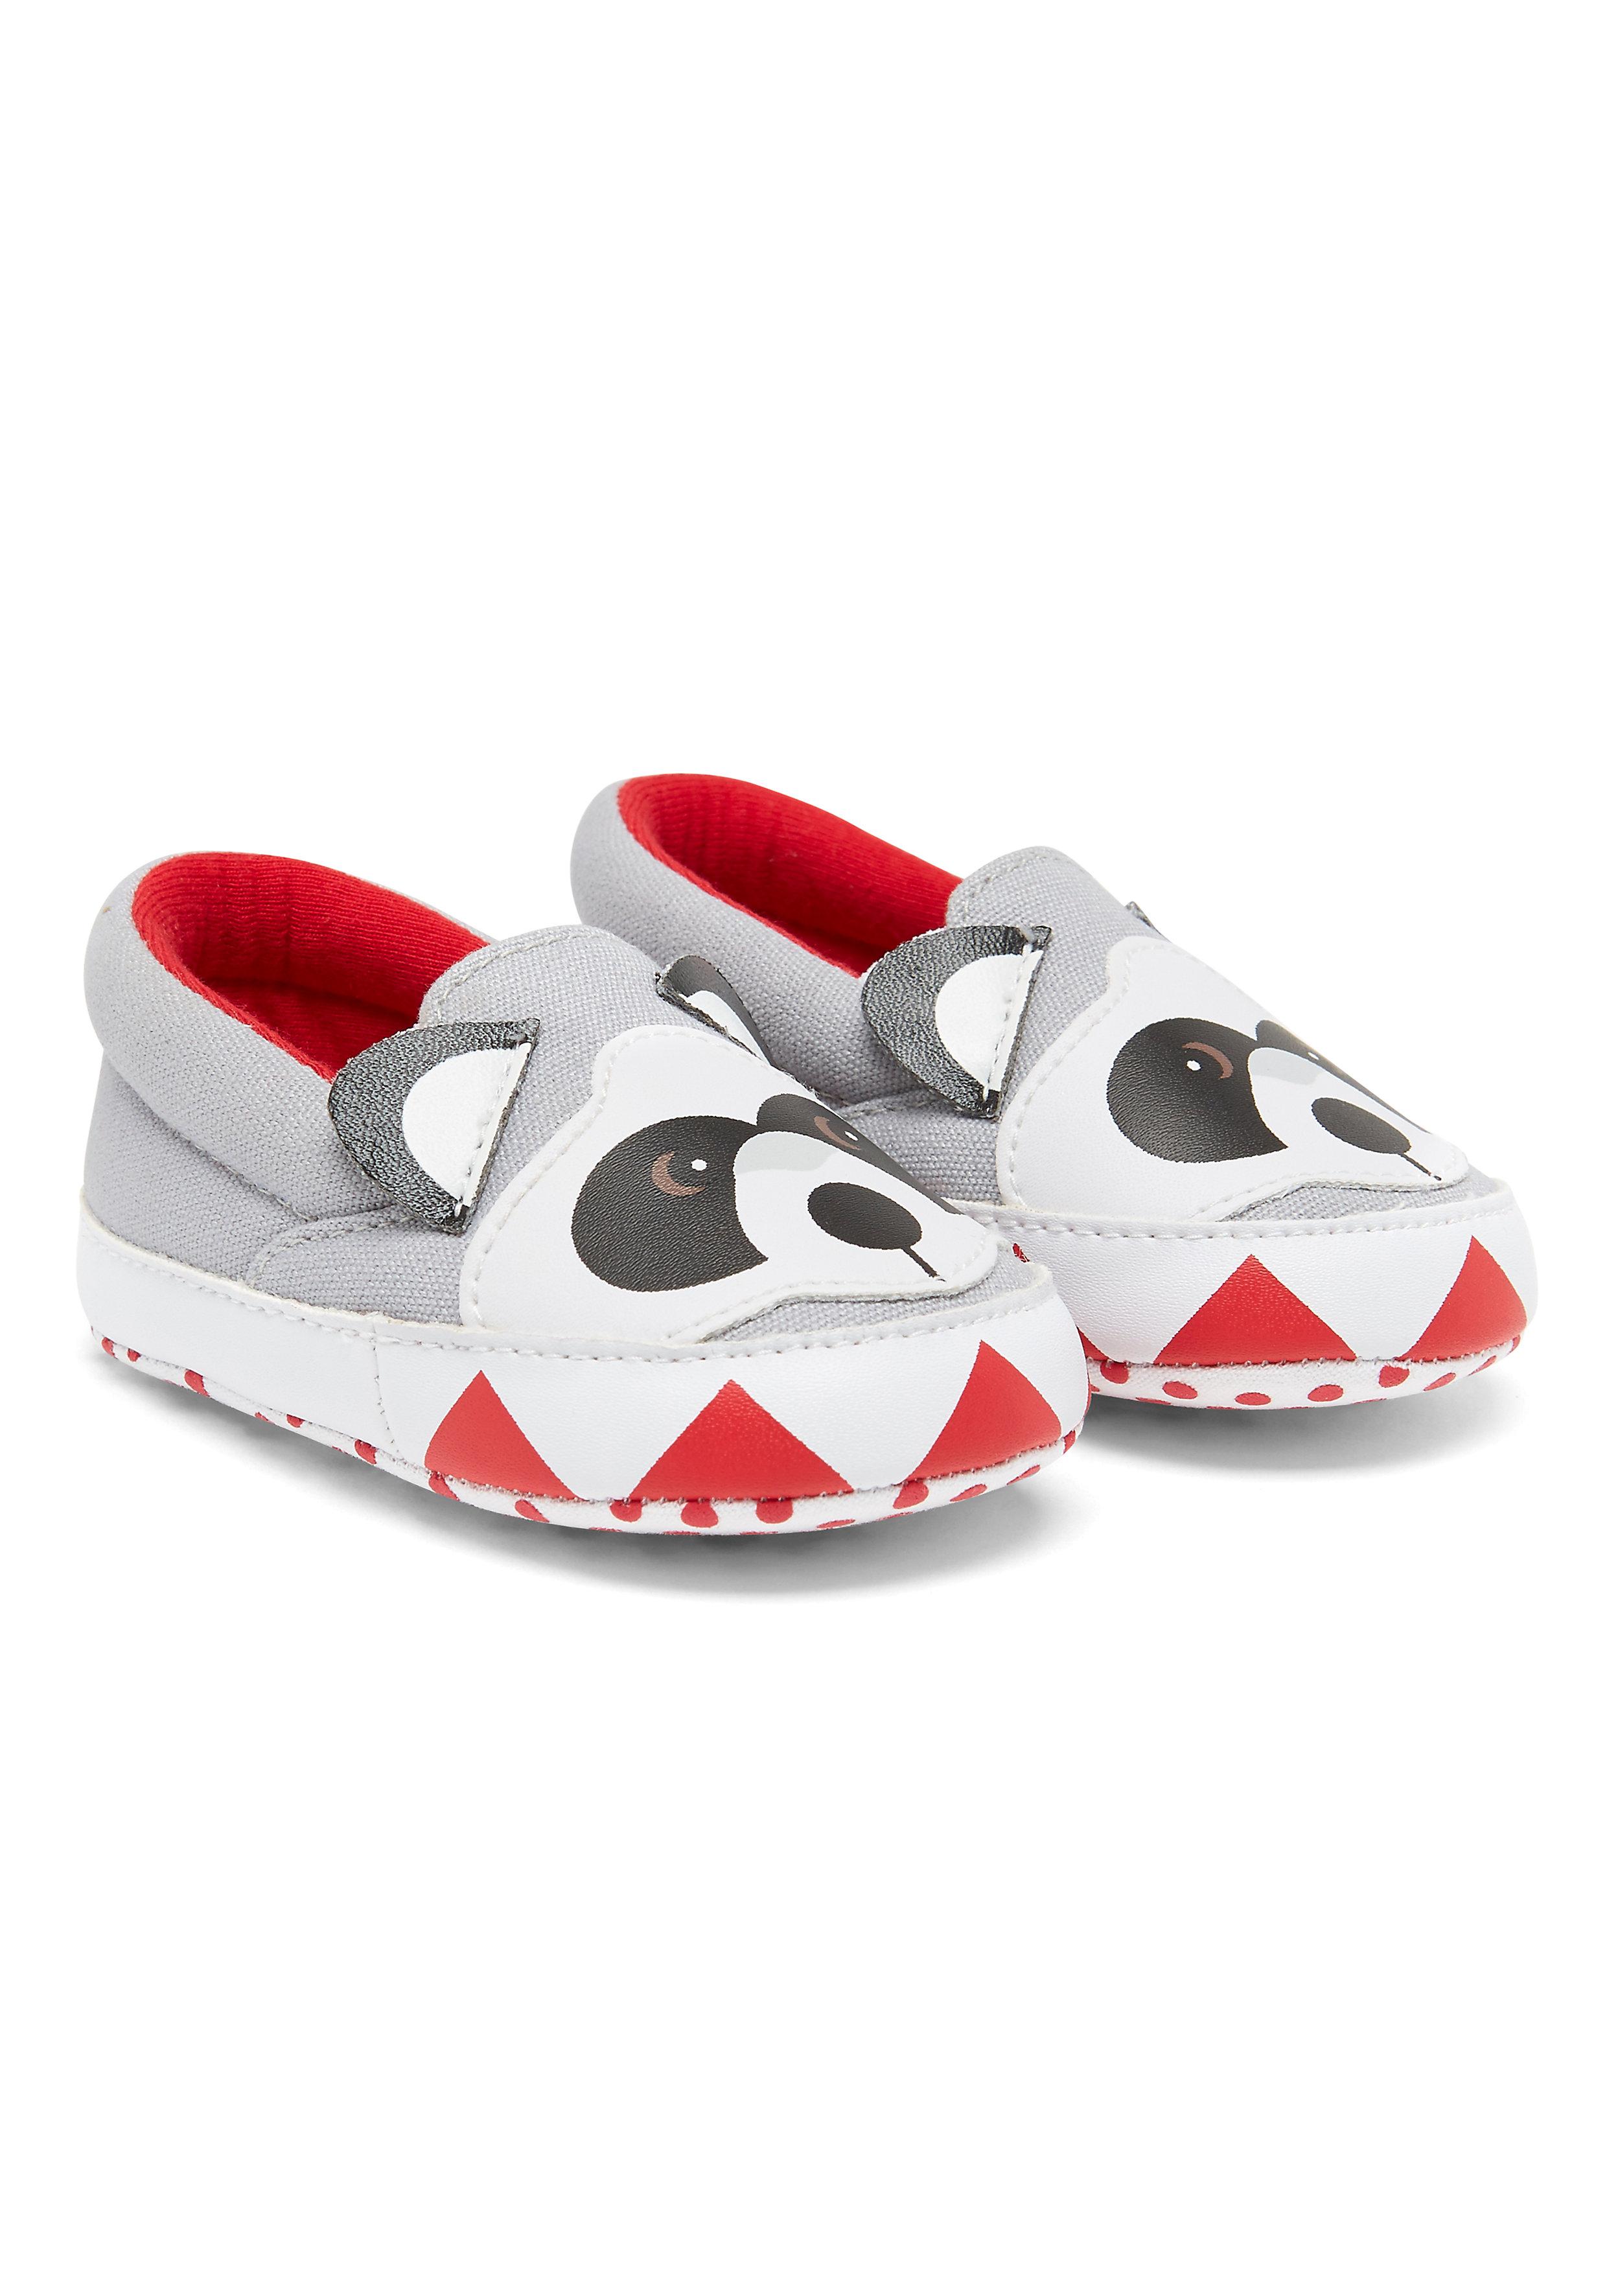 Mothercare | Boys Raccoon Shoes - Grey